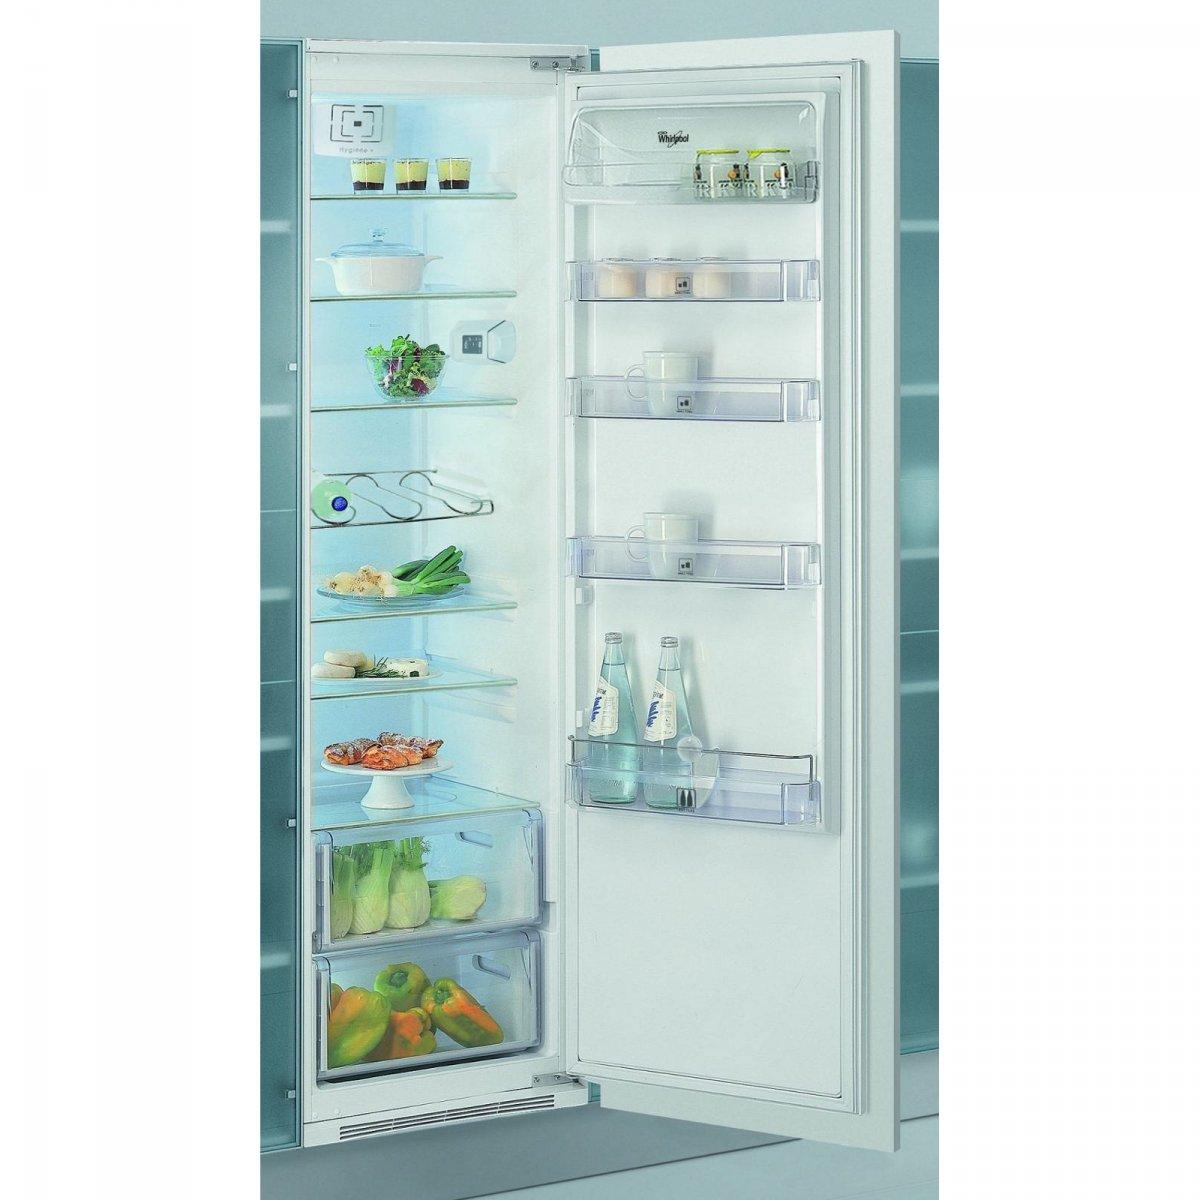 Whirlpool frigorifero arz009a 8 whirlpool elettrodomestici frigoriferi incasso - Frigoriferi da incasso monoporta ...